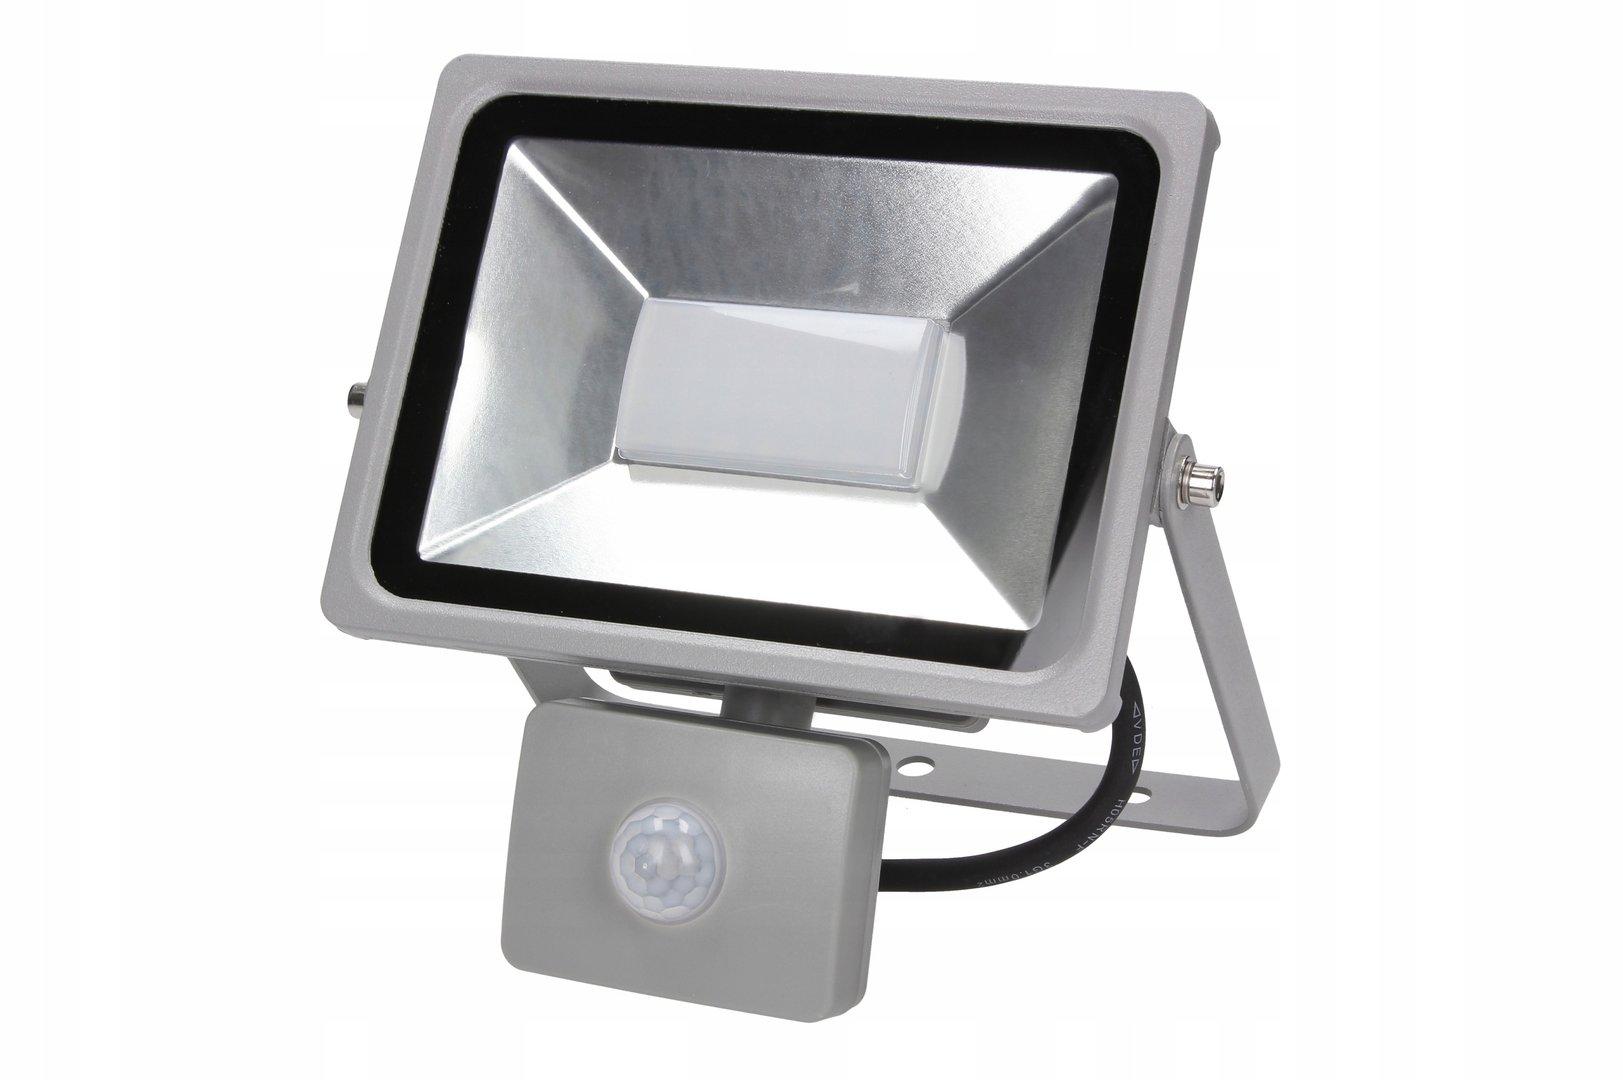 50 watt led flutlicht silber led fluter 50w 4500lm mit bewegunsmelder. Black Bedroom Furniture Sets. Home Design Ideas